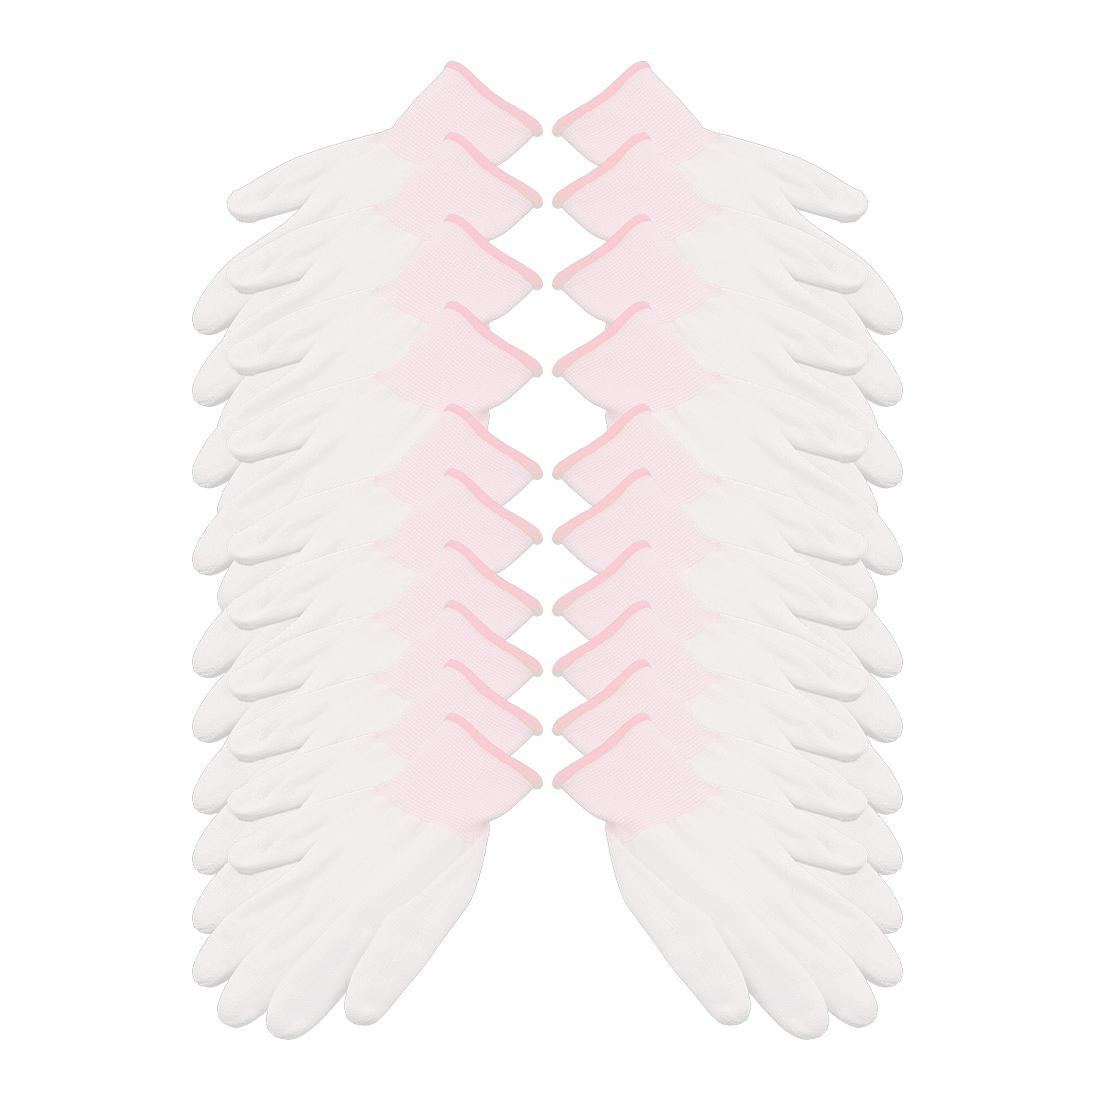 10Pairs 13 Needles Nylon Labor Protection Anti-static Non-slip Gloves White Pink